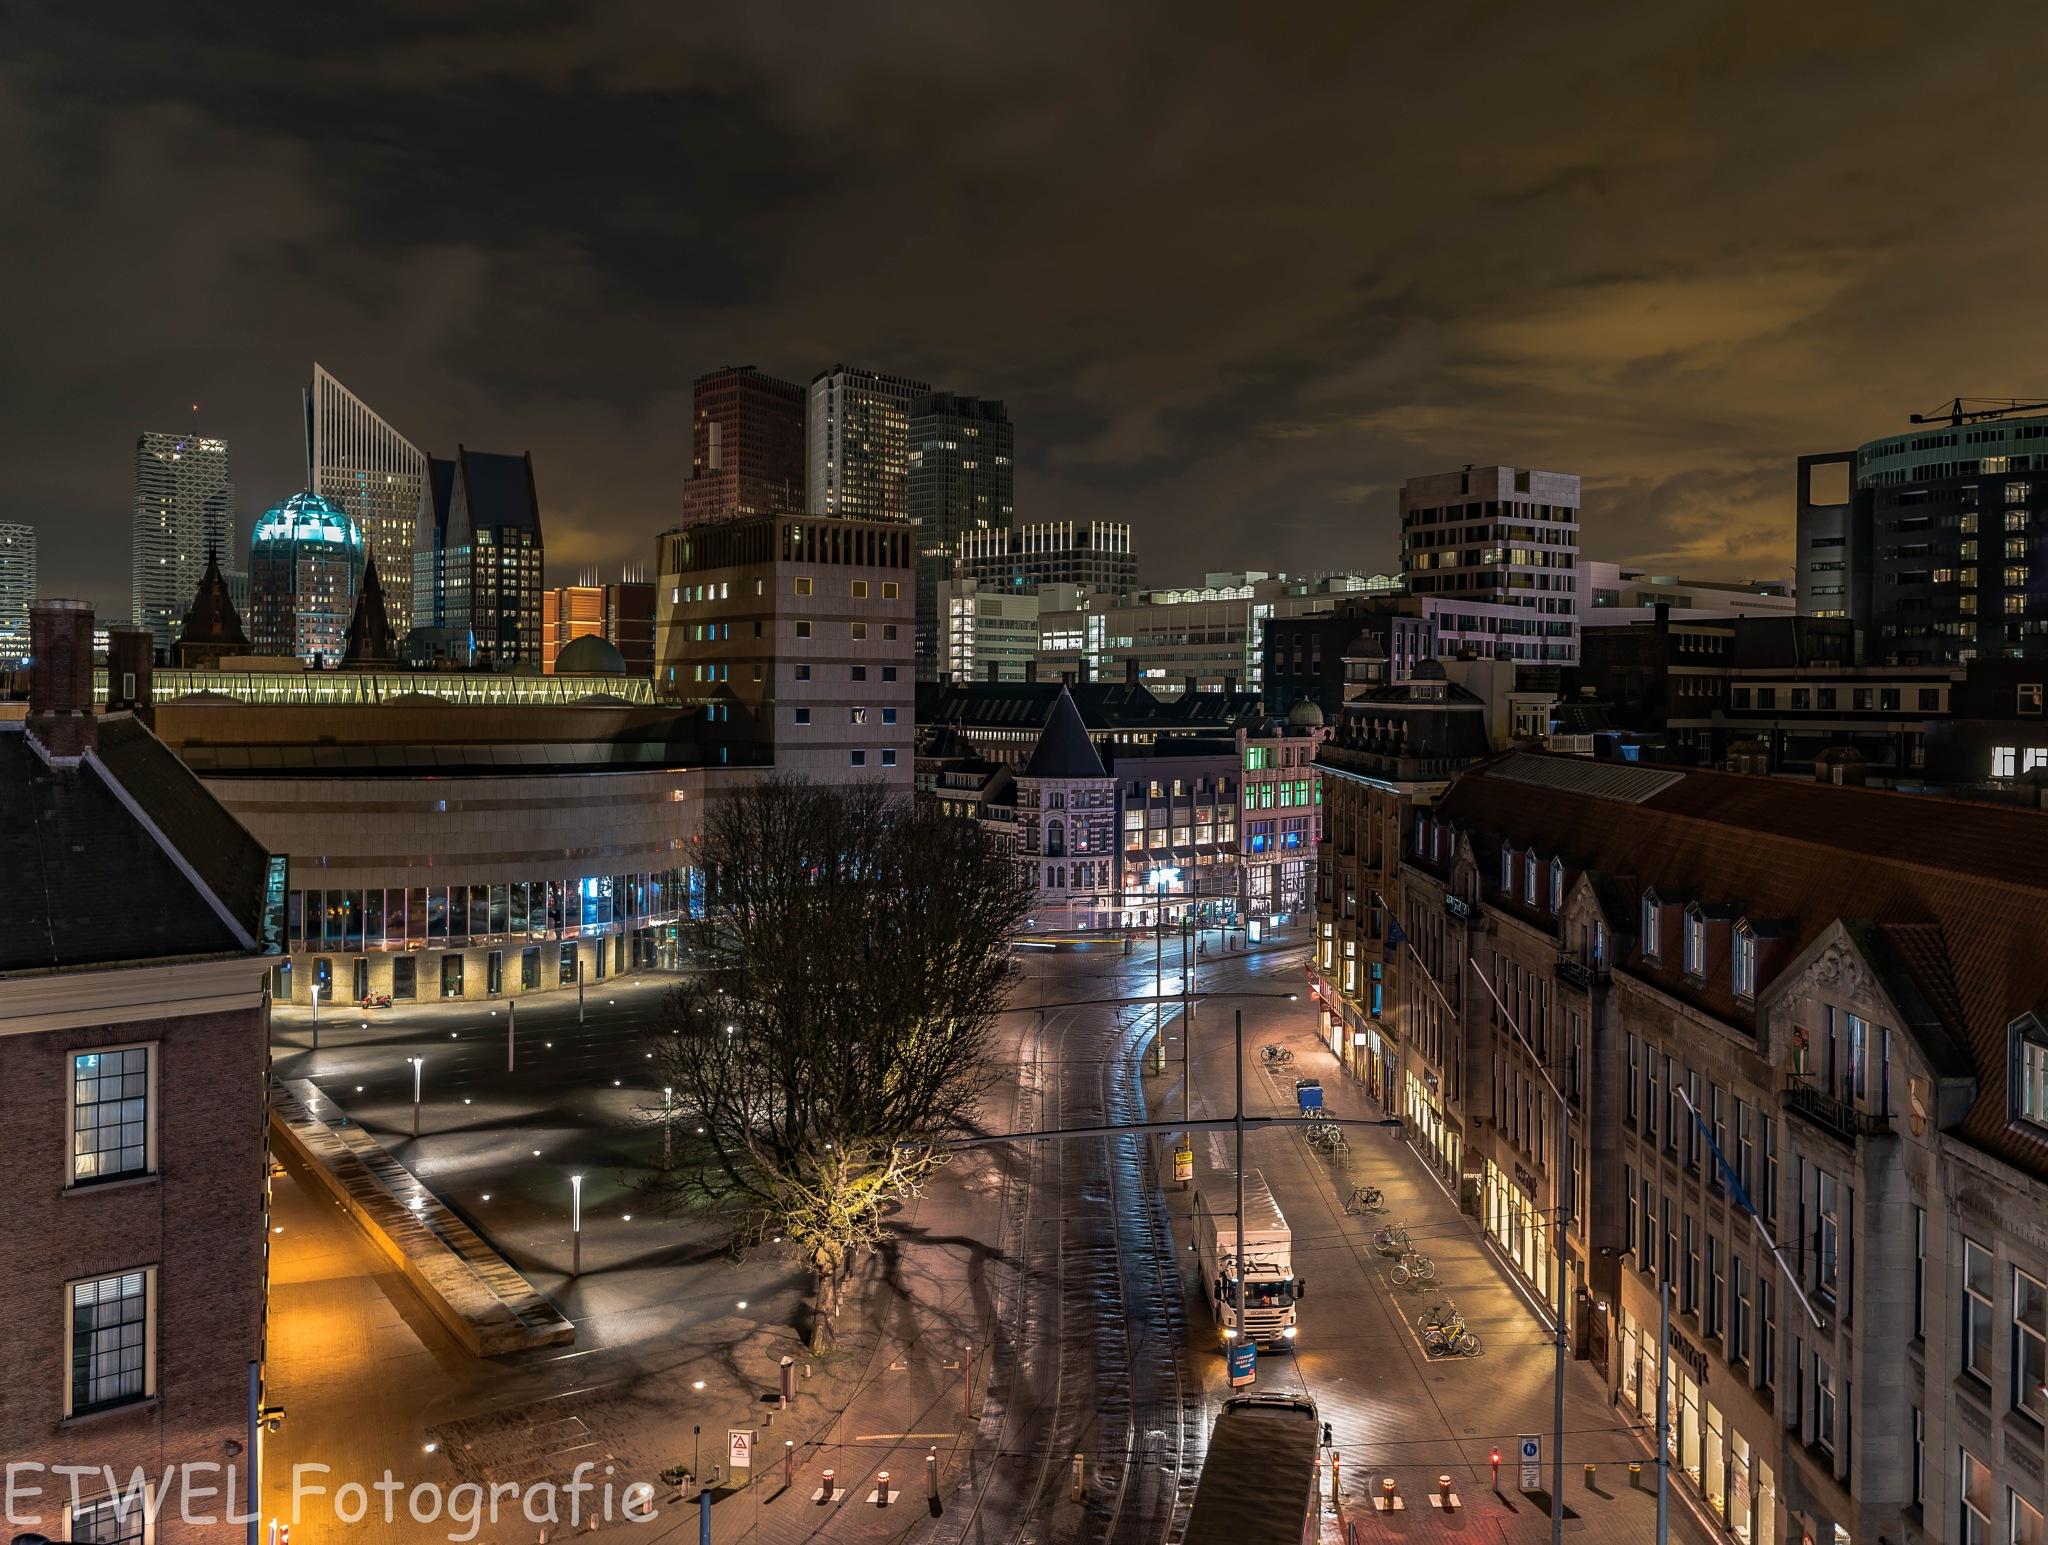 Den Haag 06:30 am by ETWEL